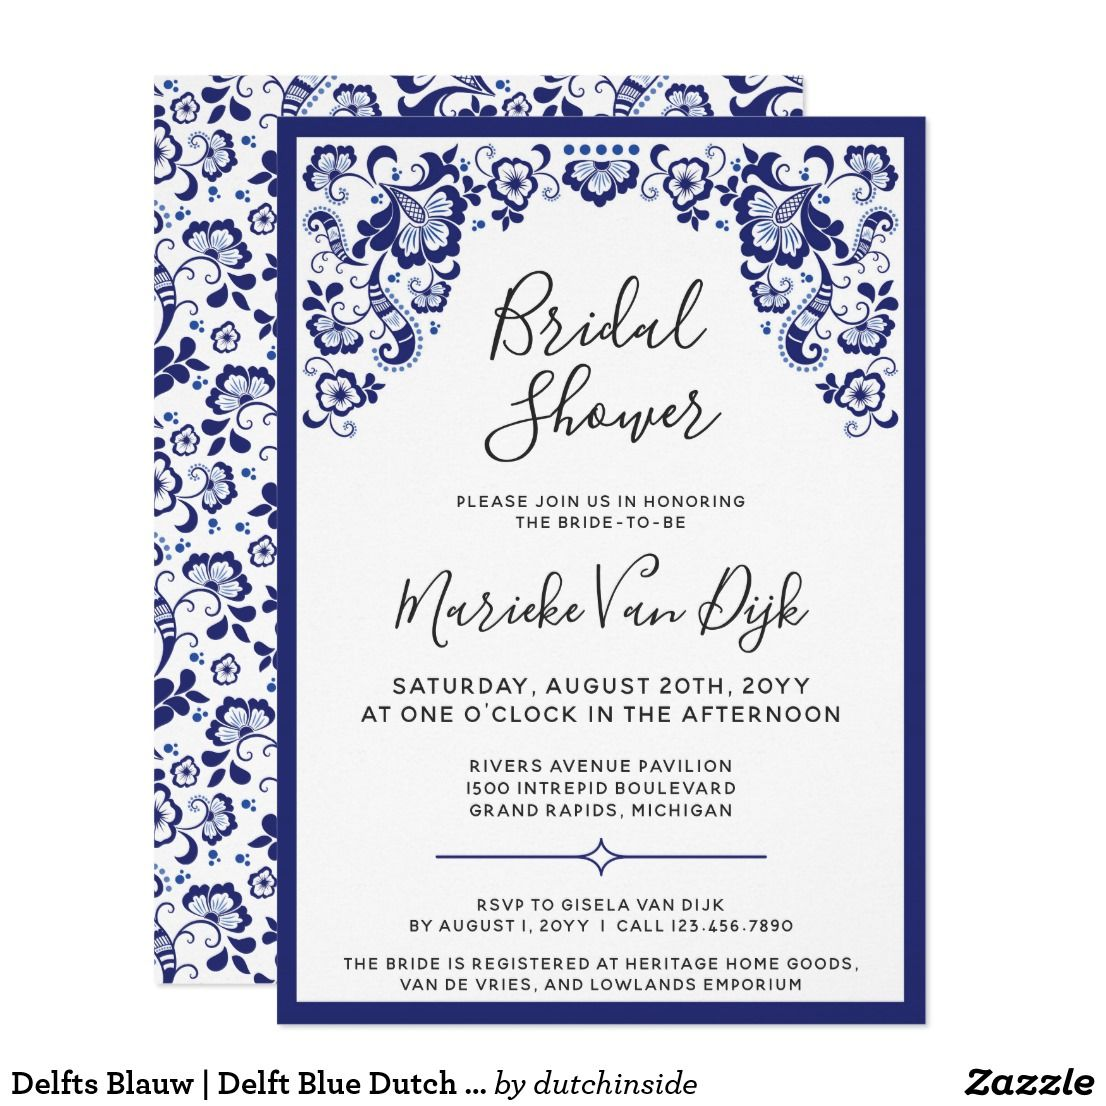 Delfts Blauw Delft Blue Dutch Bridal Shower Invitation Delfts